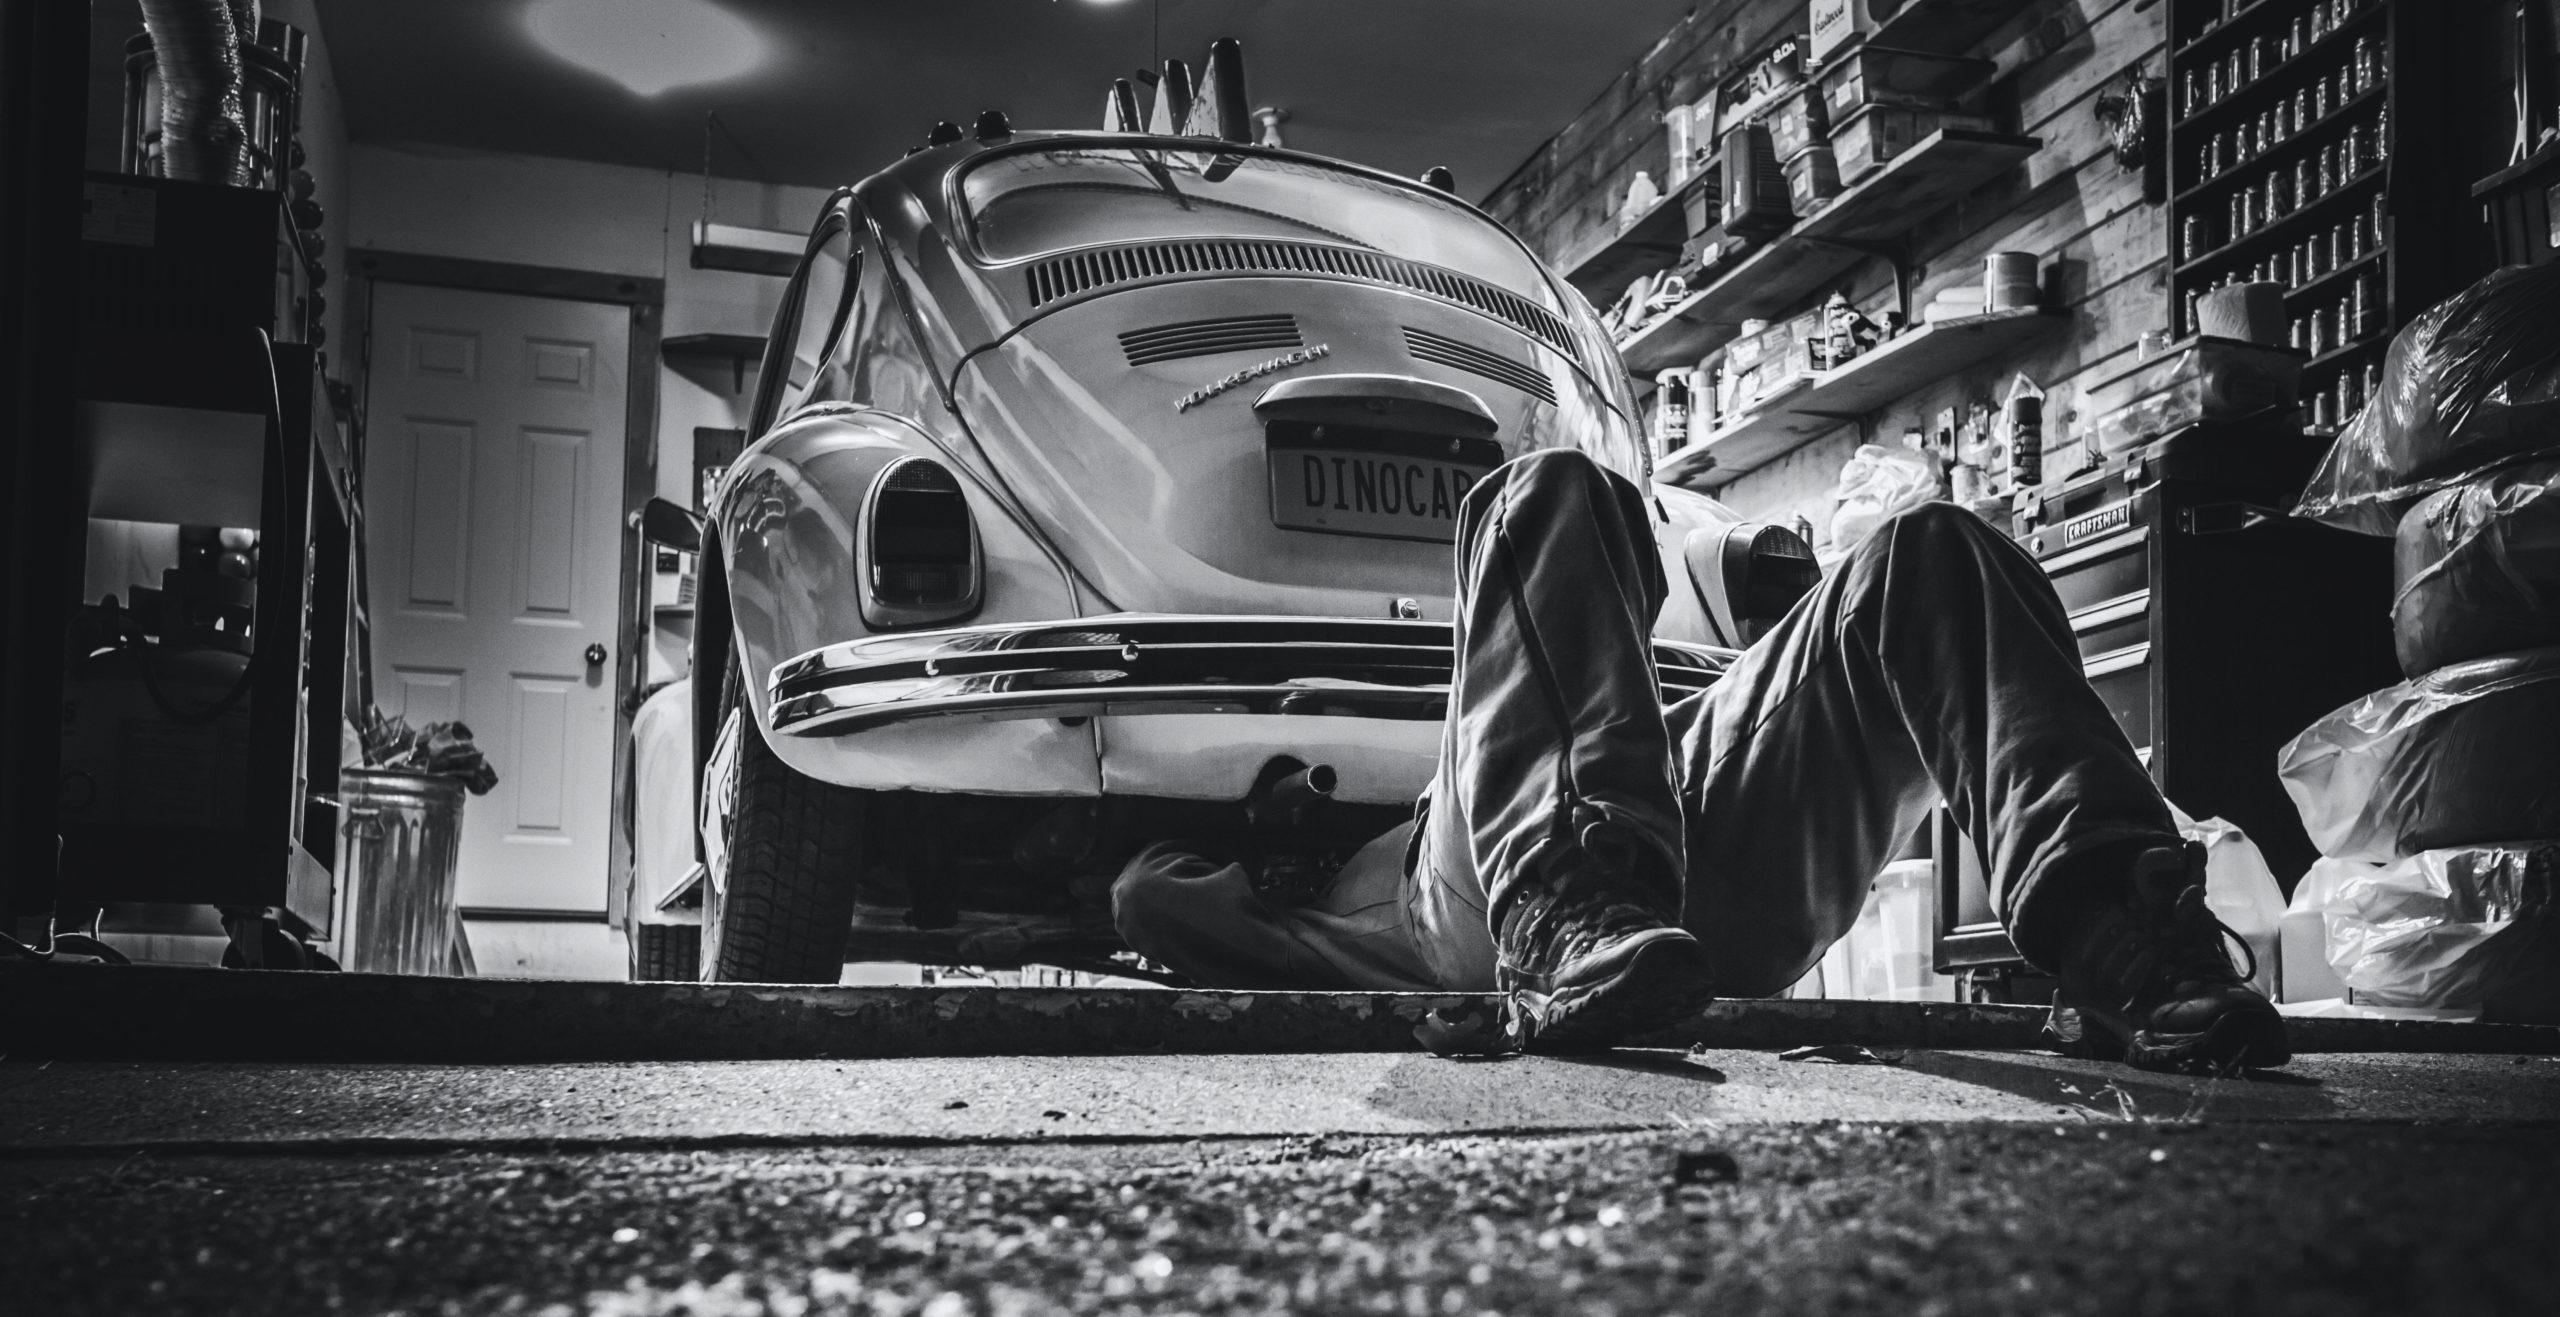 black-and-white-car-vehicle-vintage-474